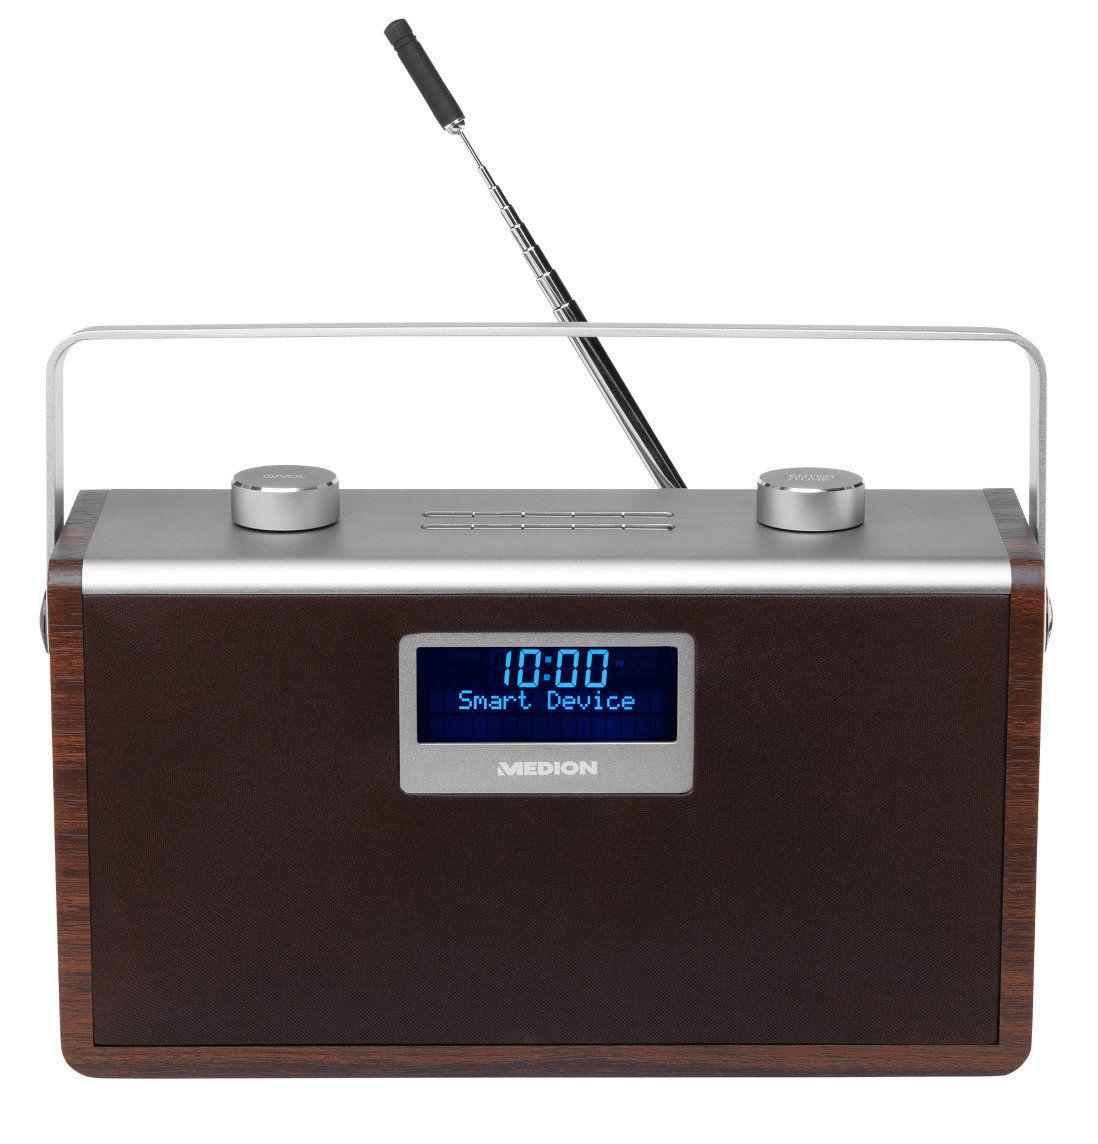 eBay - MEDION LIFE P66073 MD 80027 DAB+ Radio mit Bluetooth-Funktion 2 x 15 Watt RMS